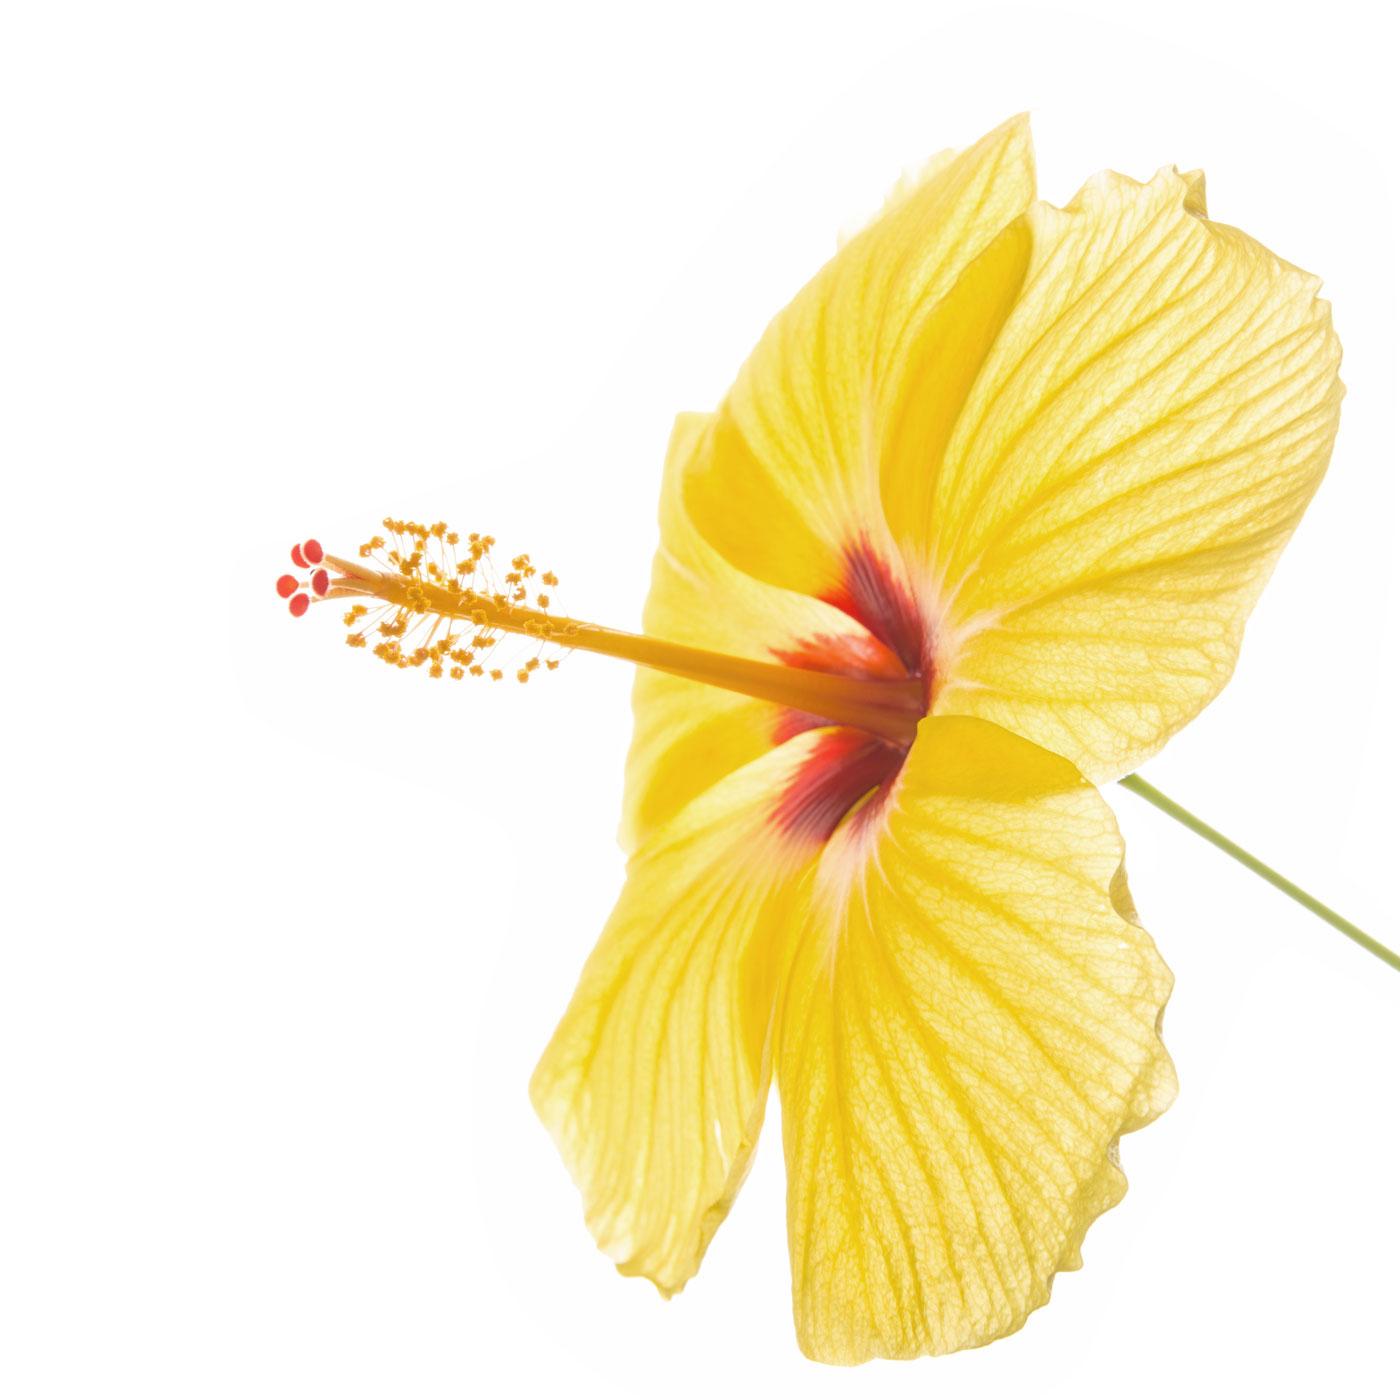 flower, tropical, flora, hibiscus, yellow, photo